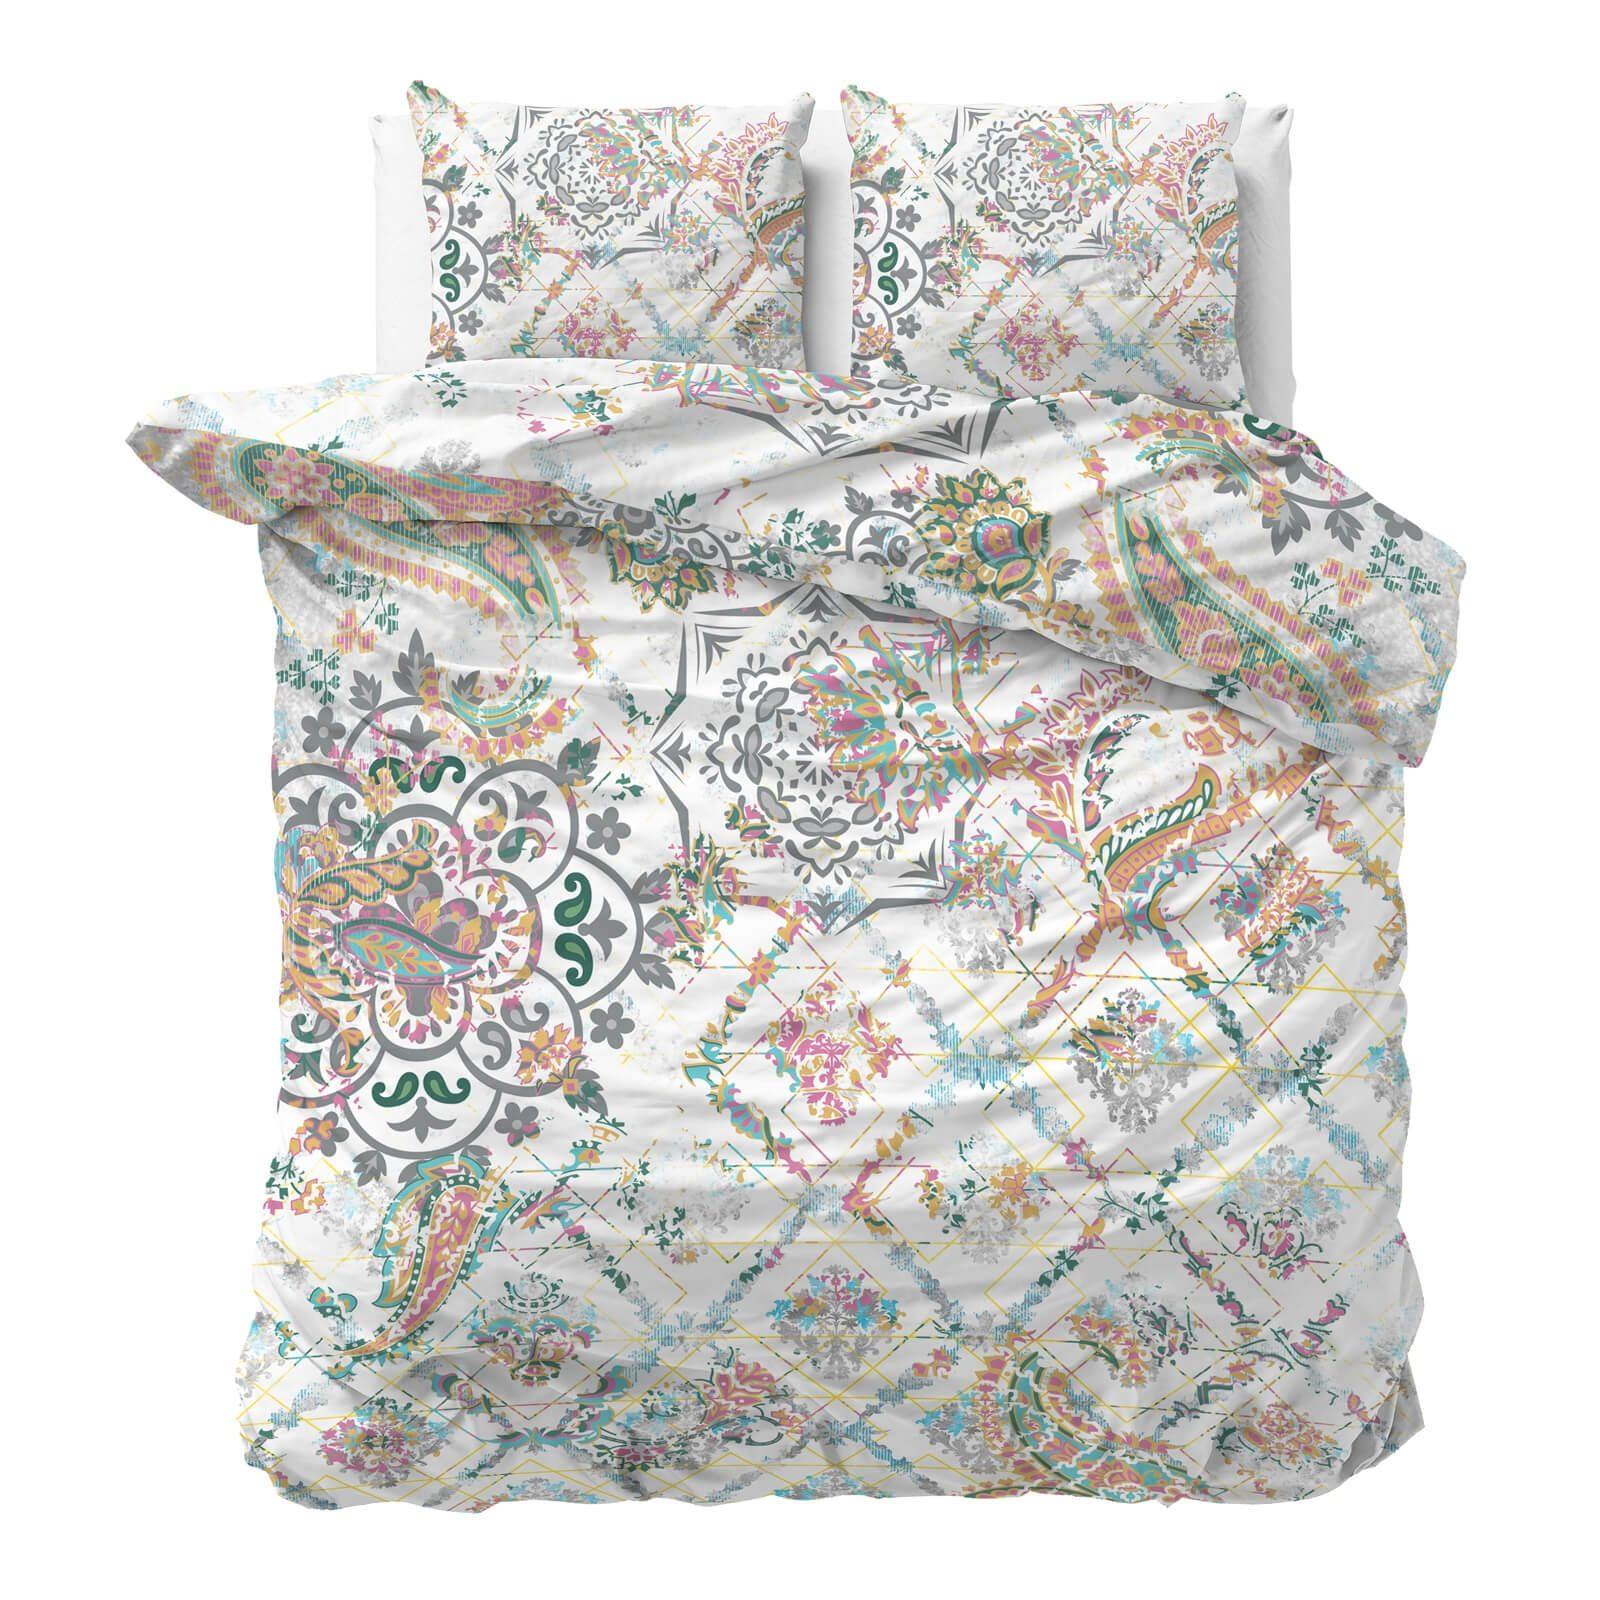 Bombažno-satenasta posteljnina Vitapur Jade